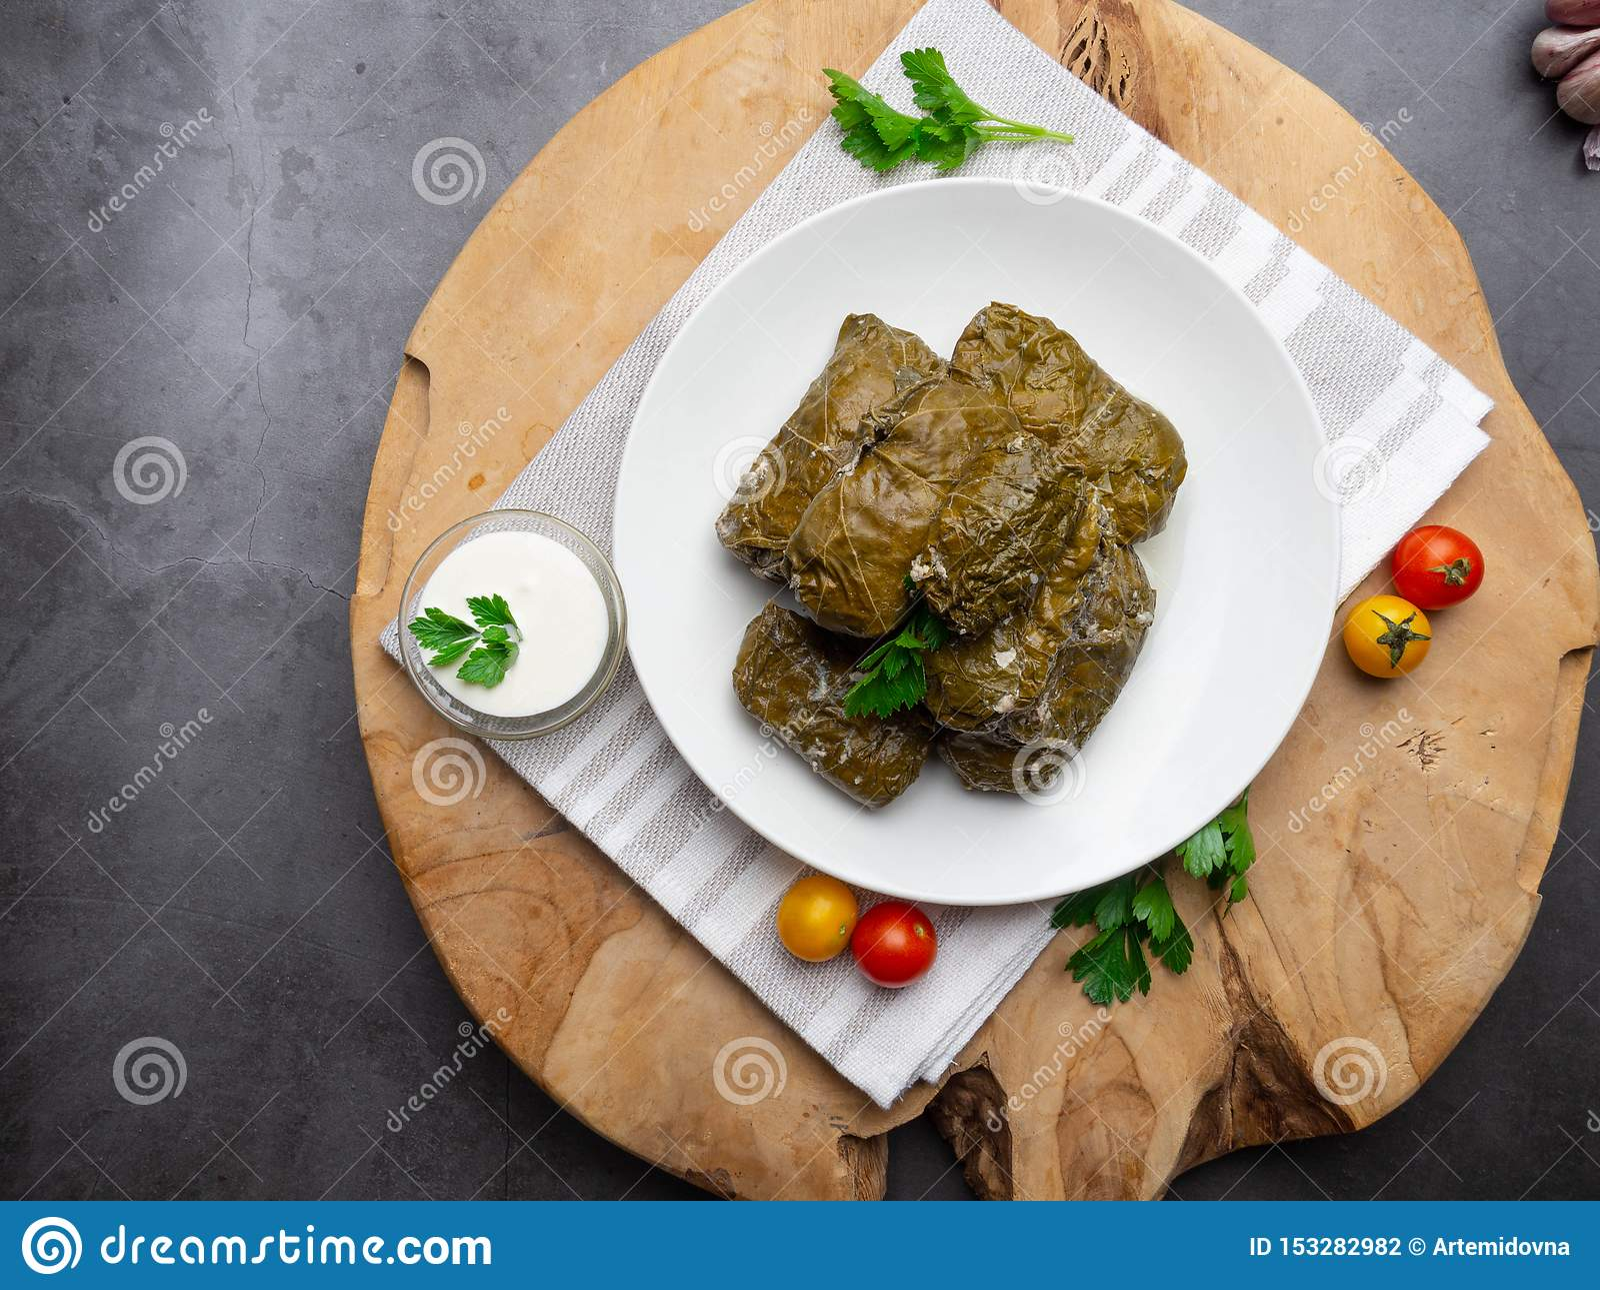 Delicious dolma sarma stuffed grape leaves rice, white yogurt sauce. Lebanese dolma sarma on plate. Lebanon turkish greek middle